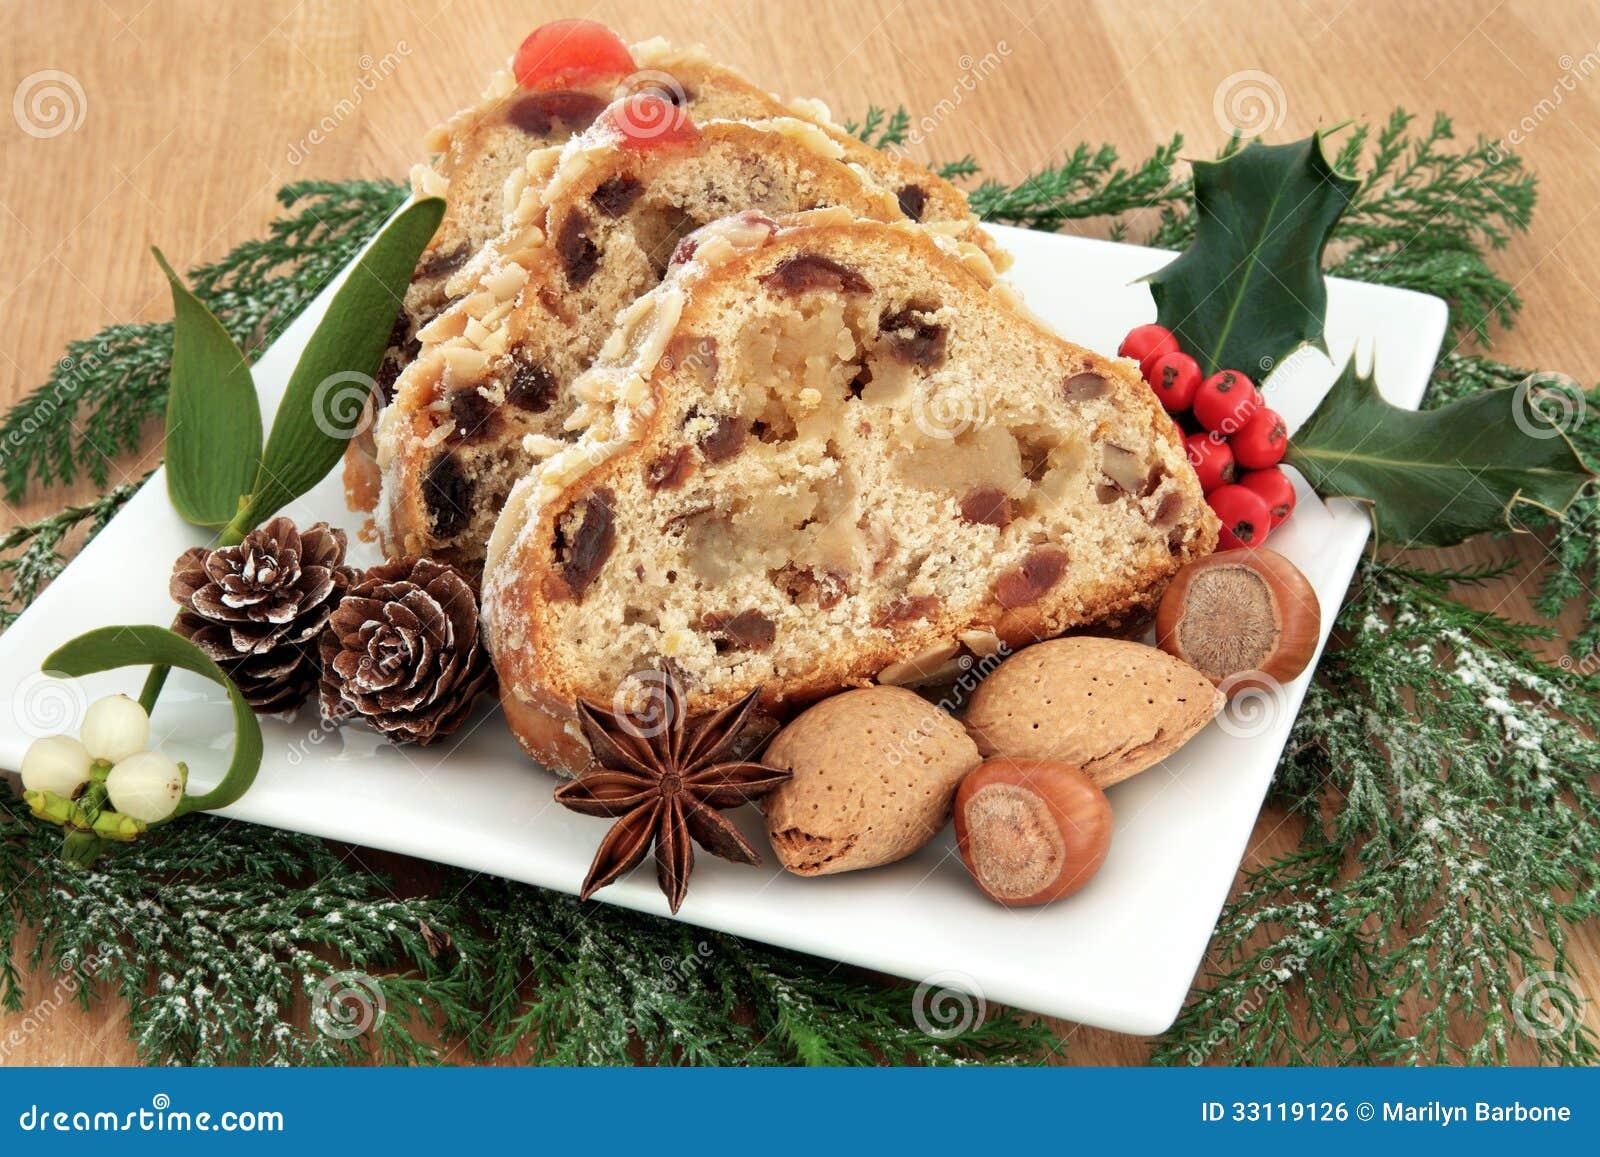 Cristmas Cake Decorative Sprigs